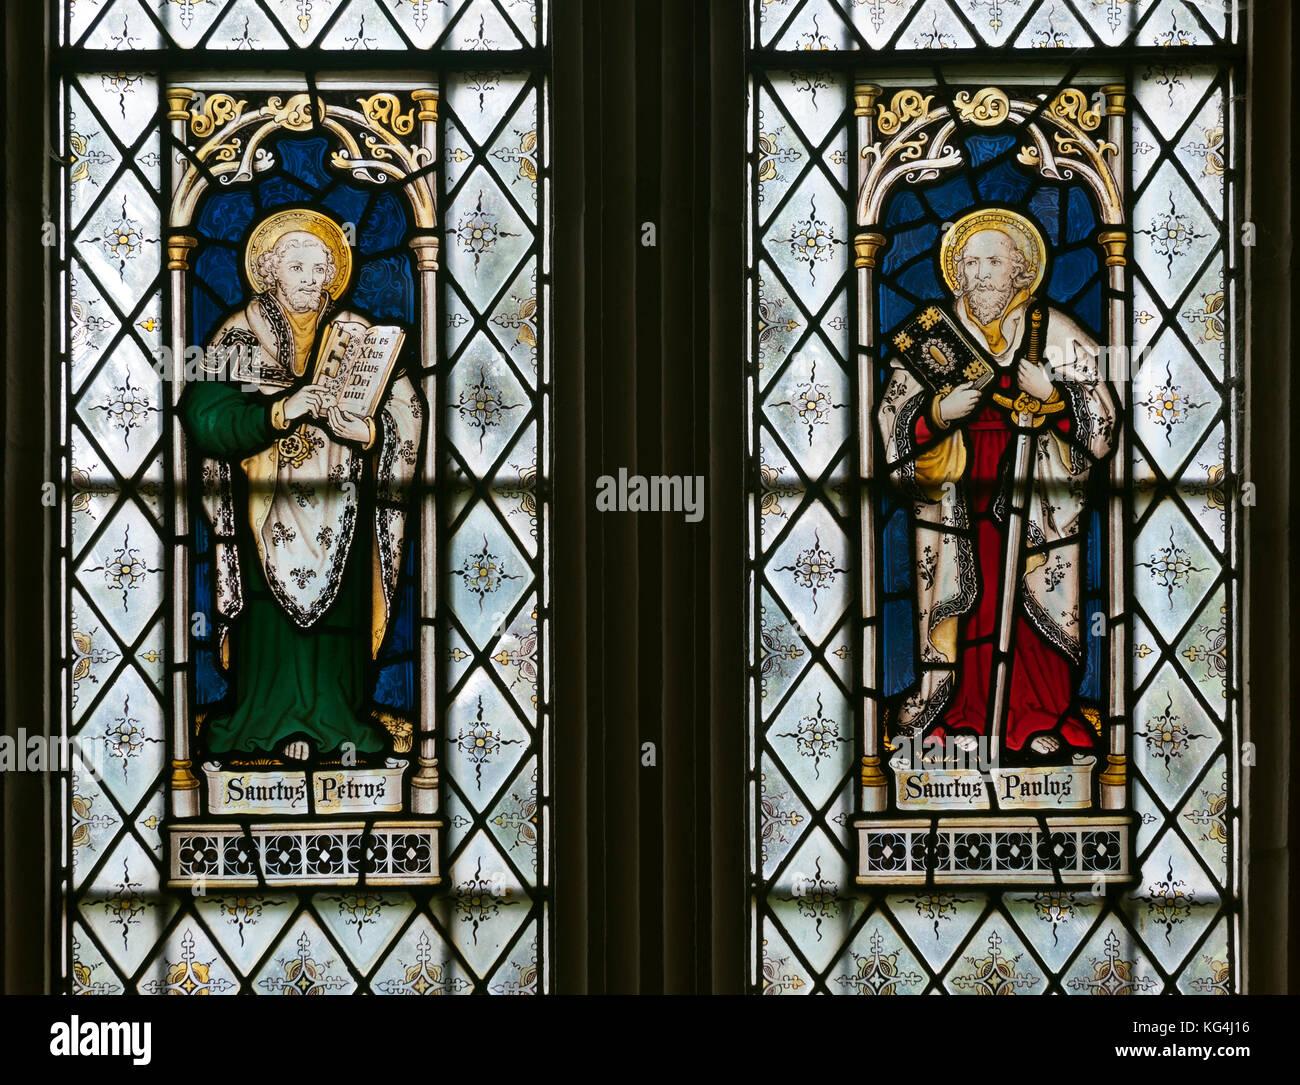 St. Peter und Paul Glasmalerei, St. Margaret's Church, Acton Scott, Shropshire, England, Großbritannien Stockbild